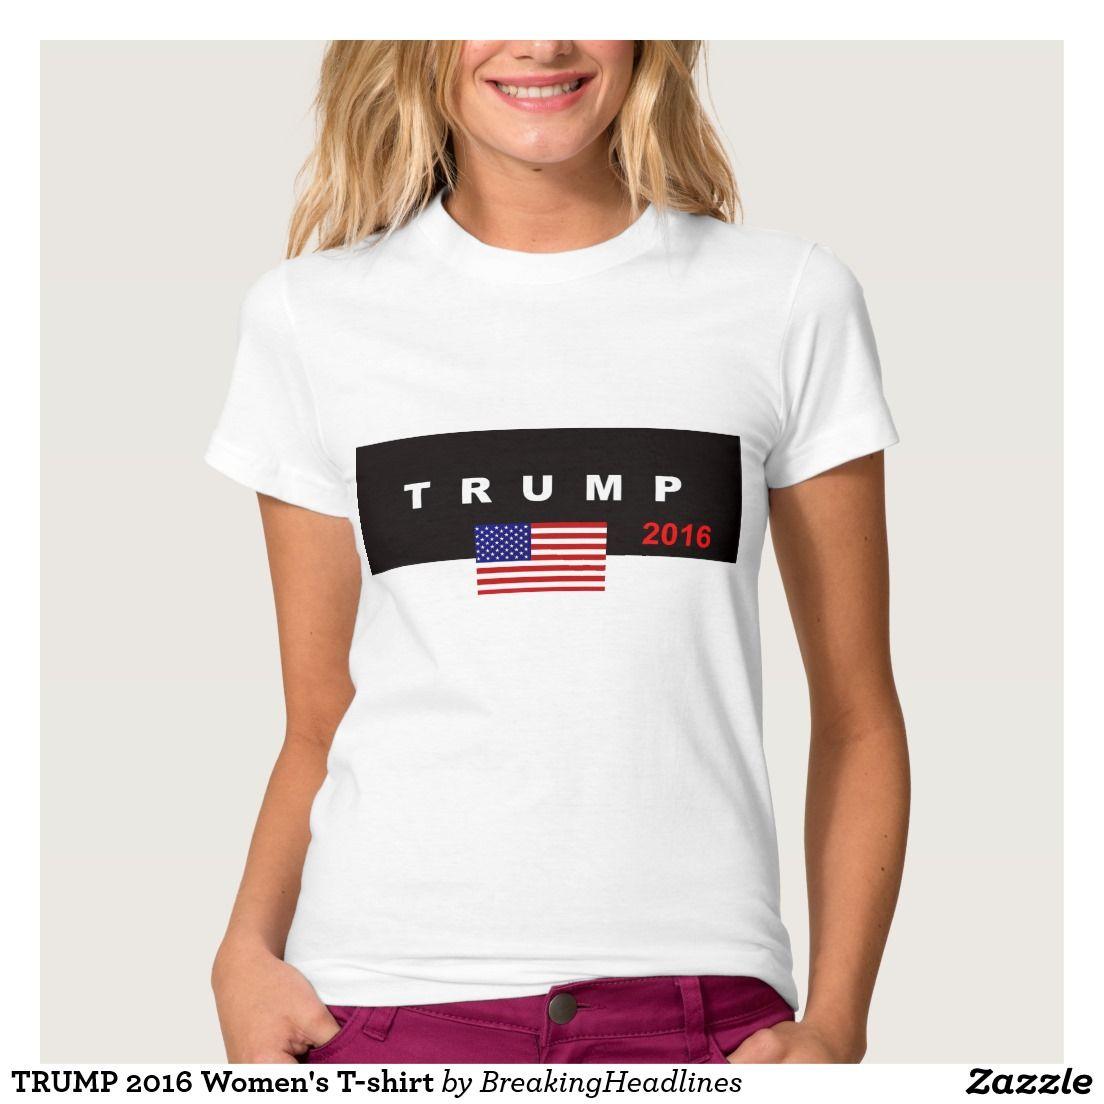 TRUMP 2016 Women's T-shirt #votetrump #votefortrump #womenstshirt #women #woman #trumpgirl #trumptrain #trump